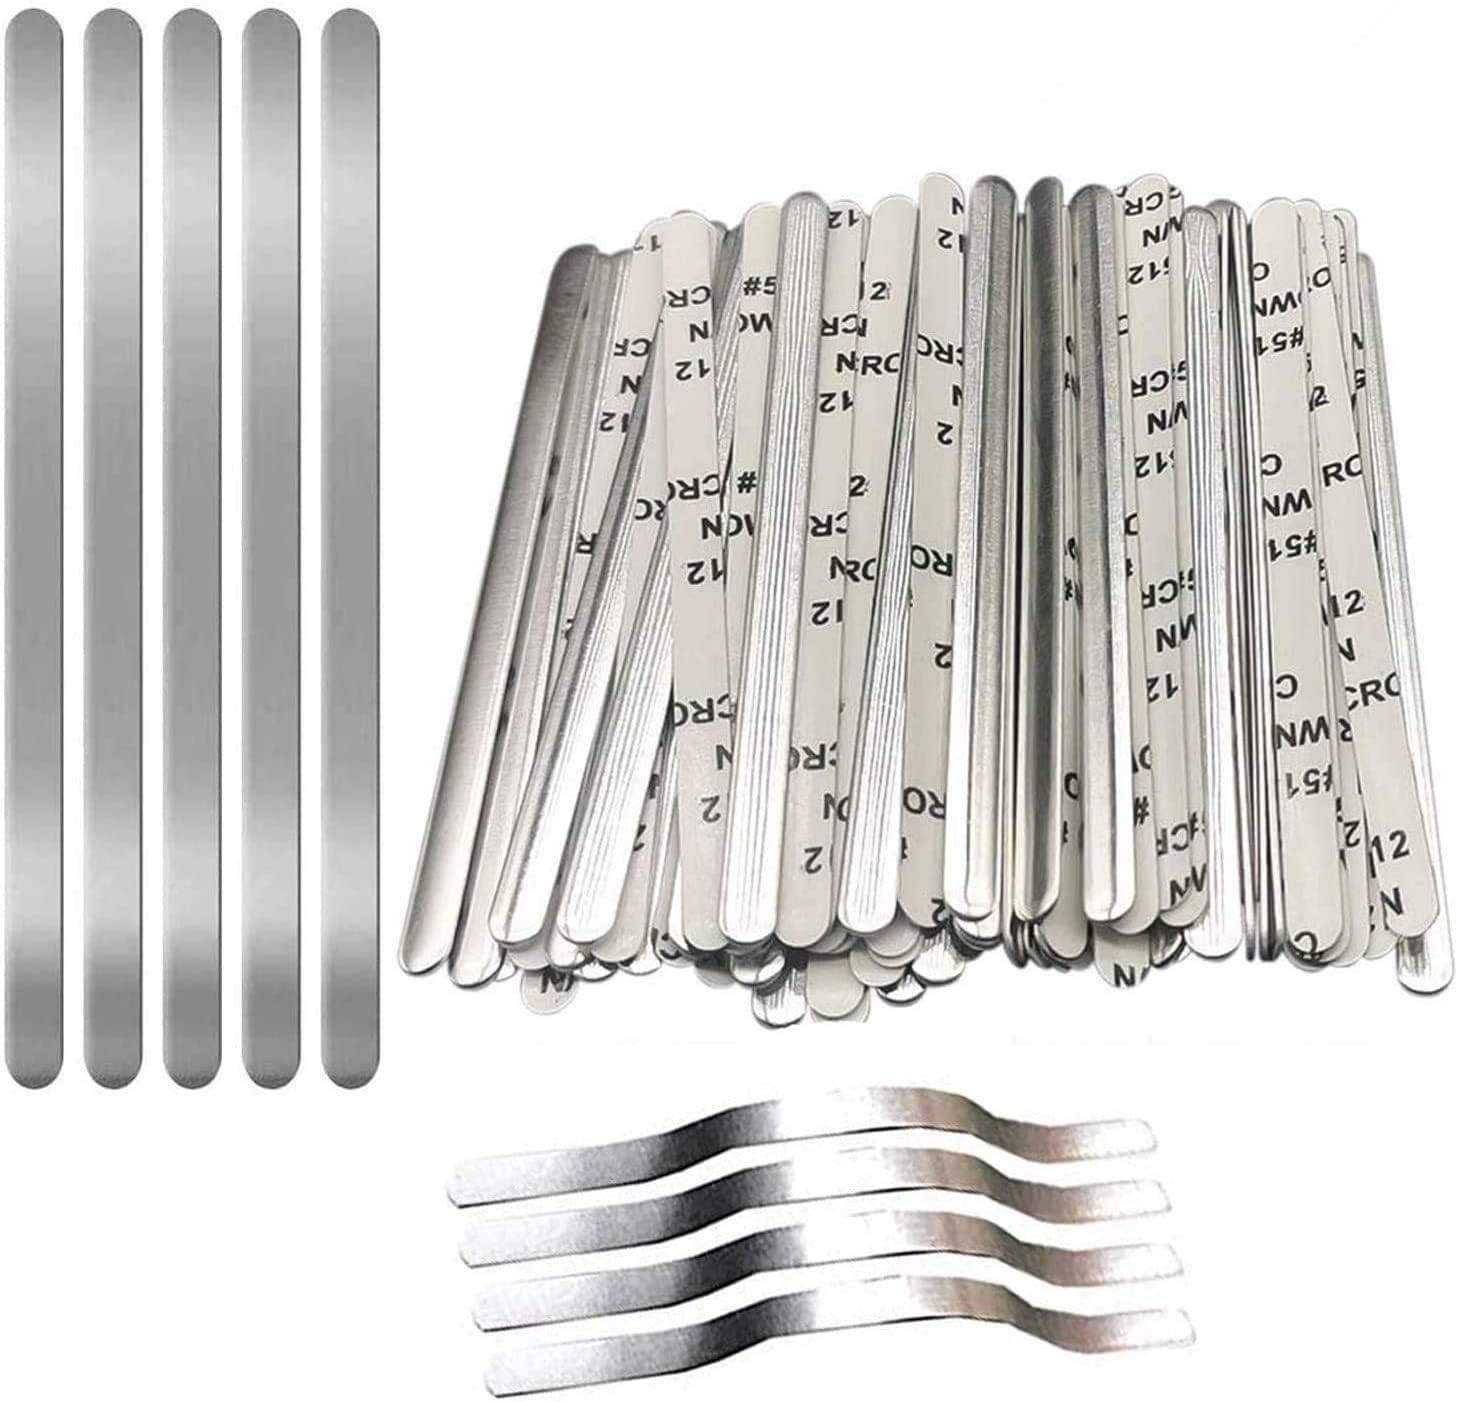 Nose Bridge Strips Fixed price for sale for OFFicial shop Masks Strip Aluminum Metal Adjusta